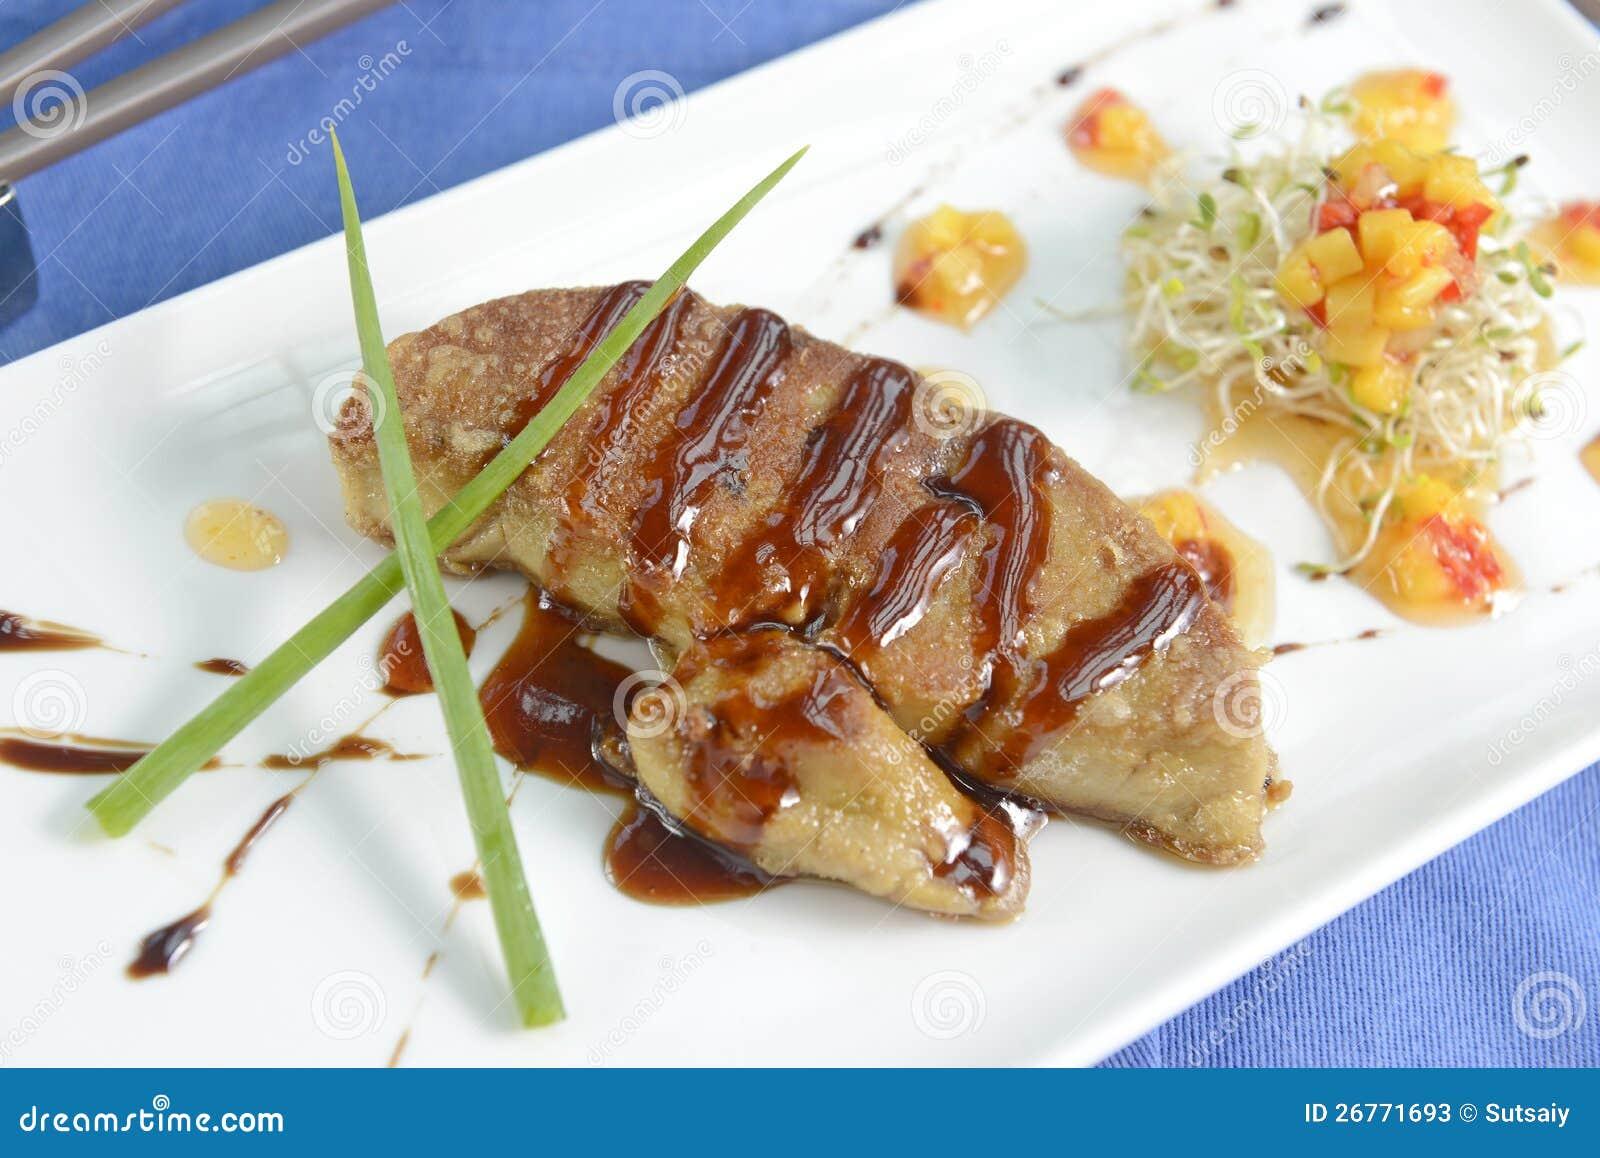 Gras de Foie, um prato delicioso